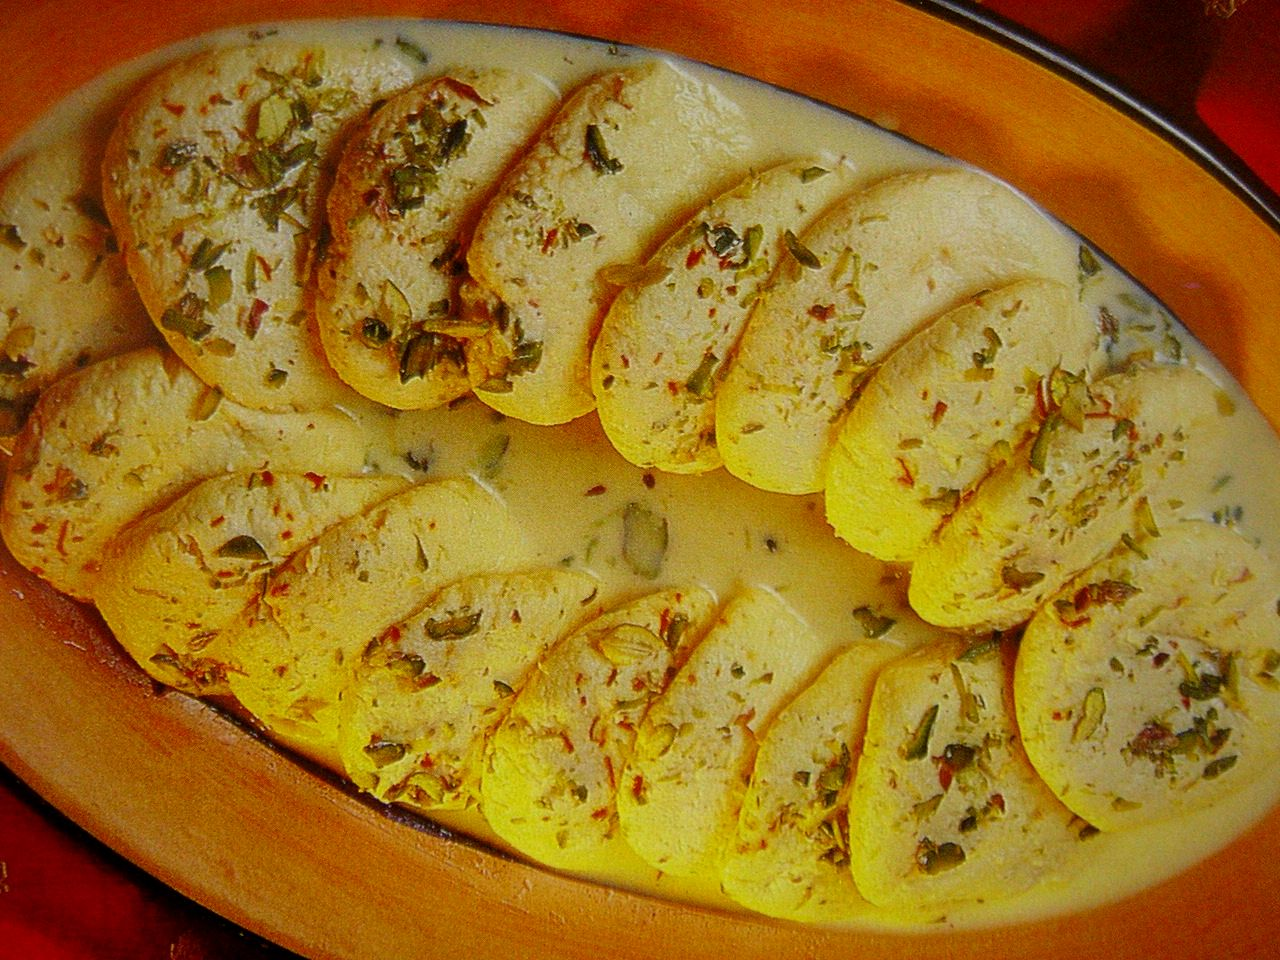 http://bengalicuisine.files.wordpress.com/2008/11/arundhuti_rasmalai.jpg